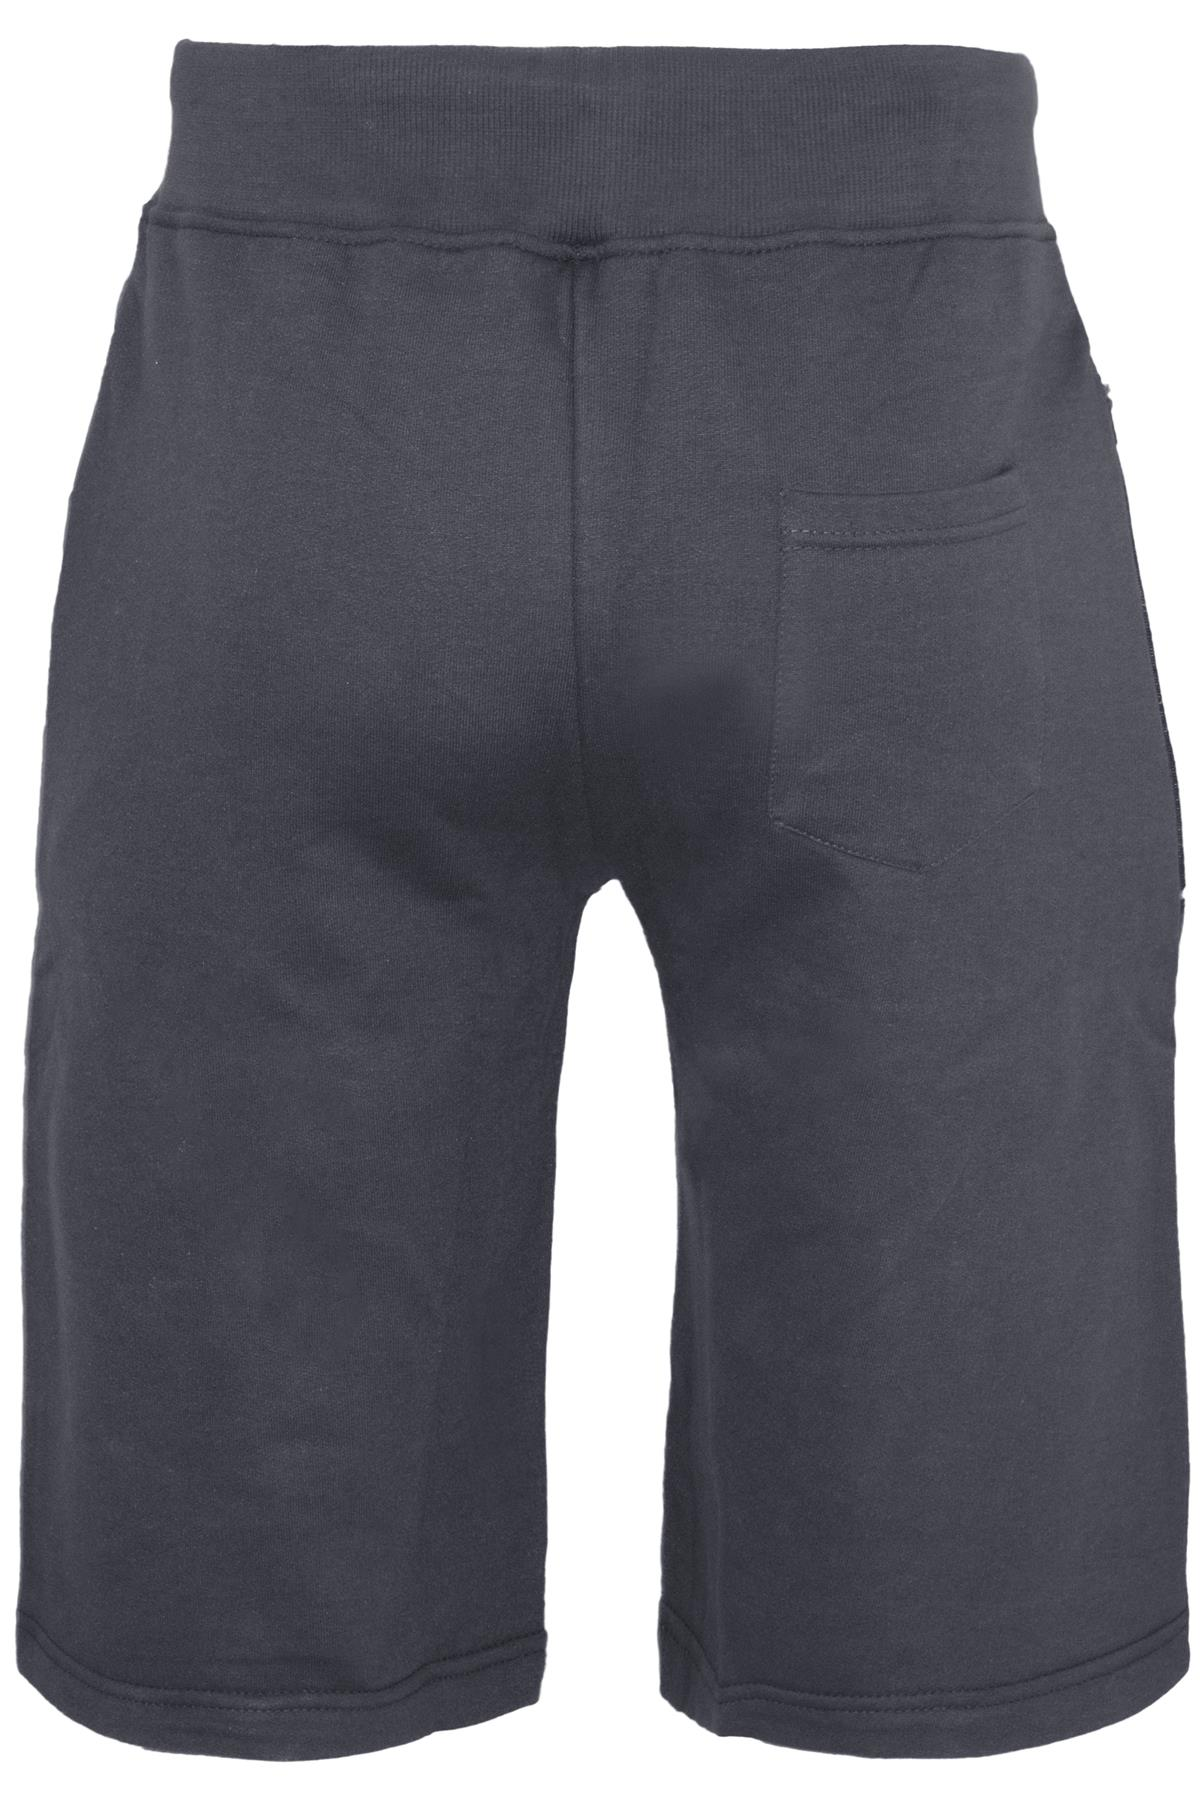 Mens-Contrast-Panel-Running-Summer-Side-Slit-Knee-Length-Fleece-Bottoms-Shorts thumbnail 44